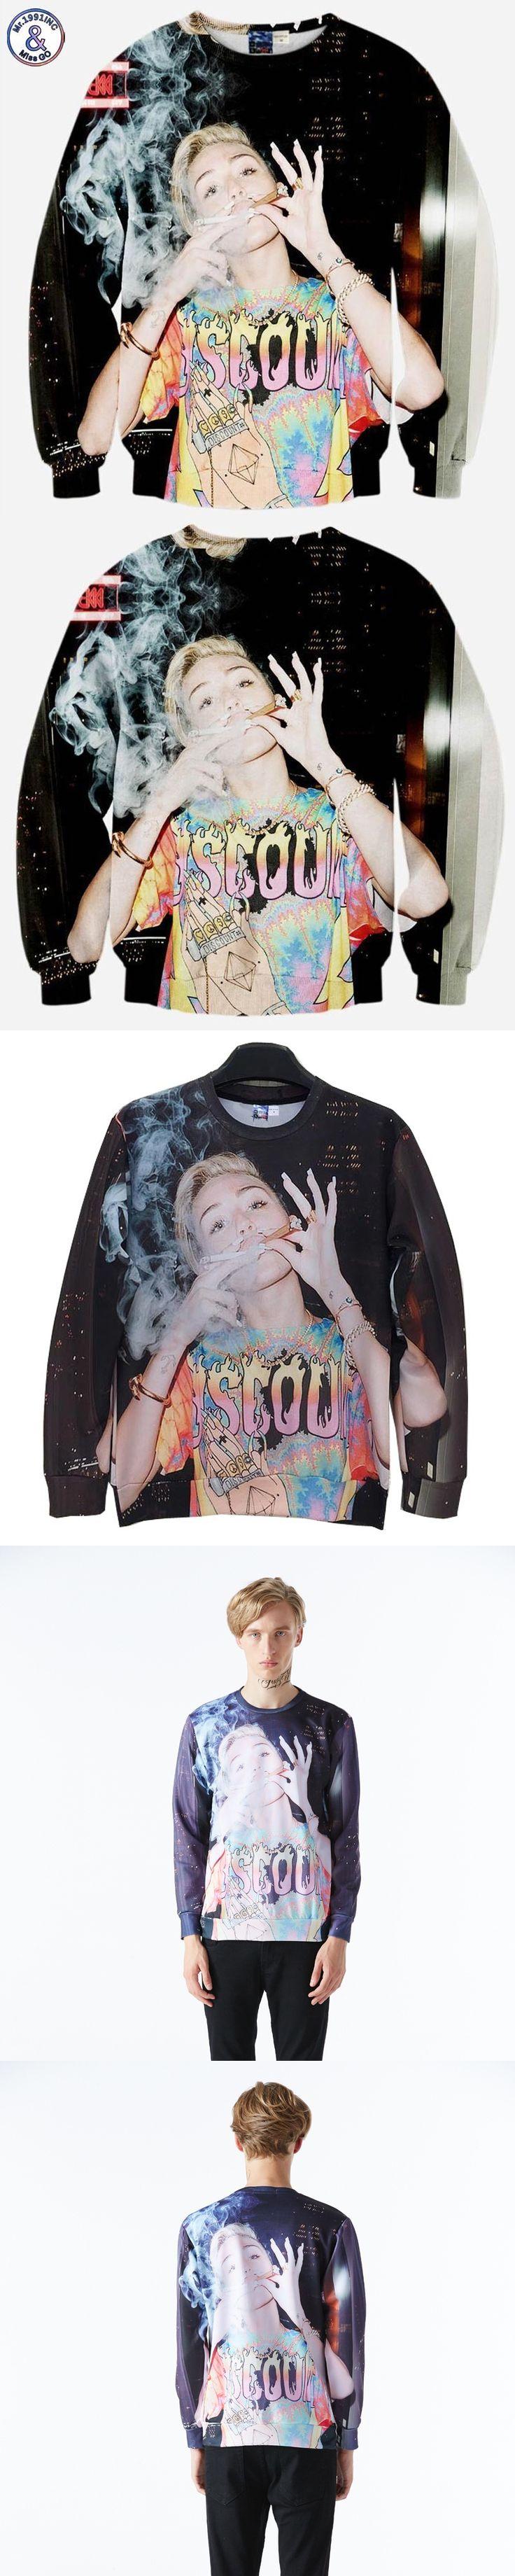 2017 Mr.1991INC Men/women 3d sweatshirts print sexy smoking lady Miley Cyrus cartoon casual hoodies Harajuku Hoody tops W188